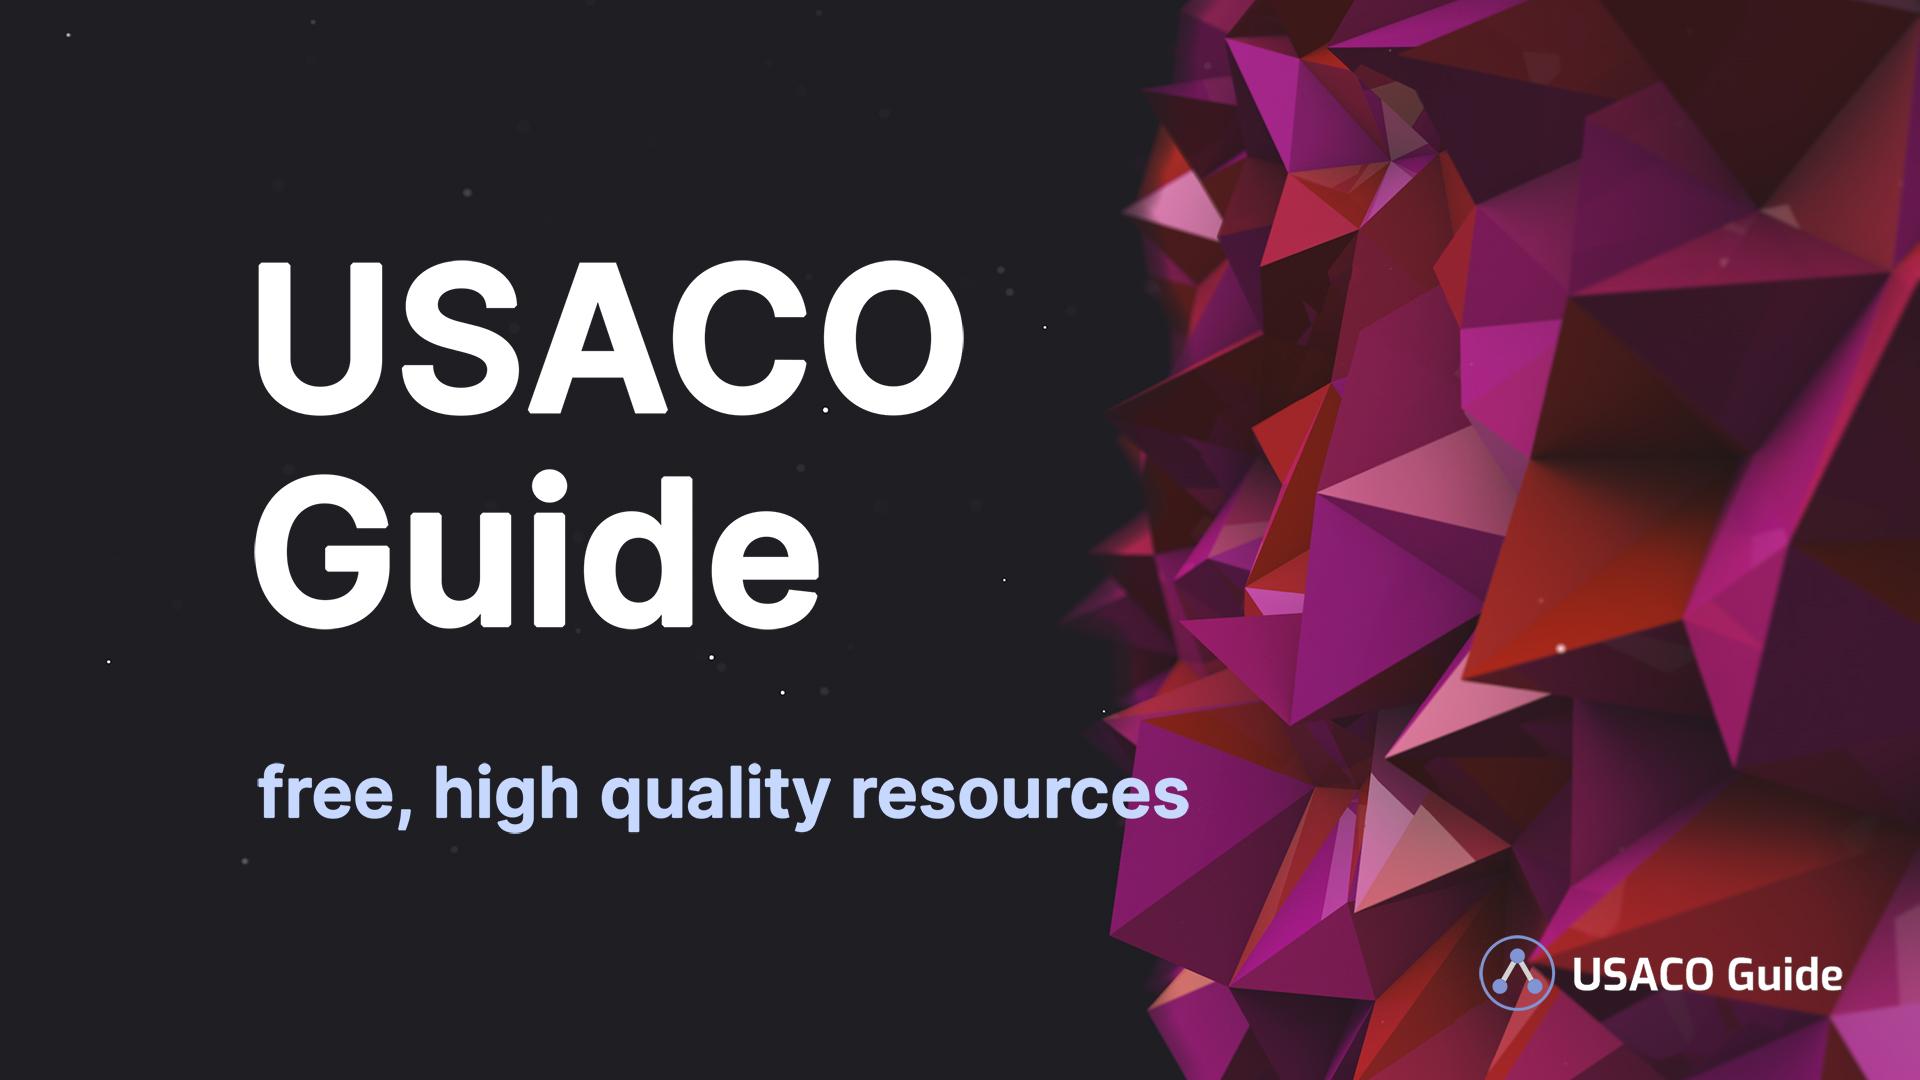 USACO Guide